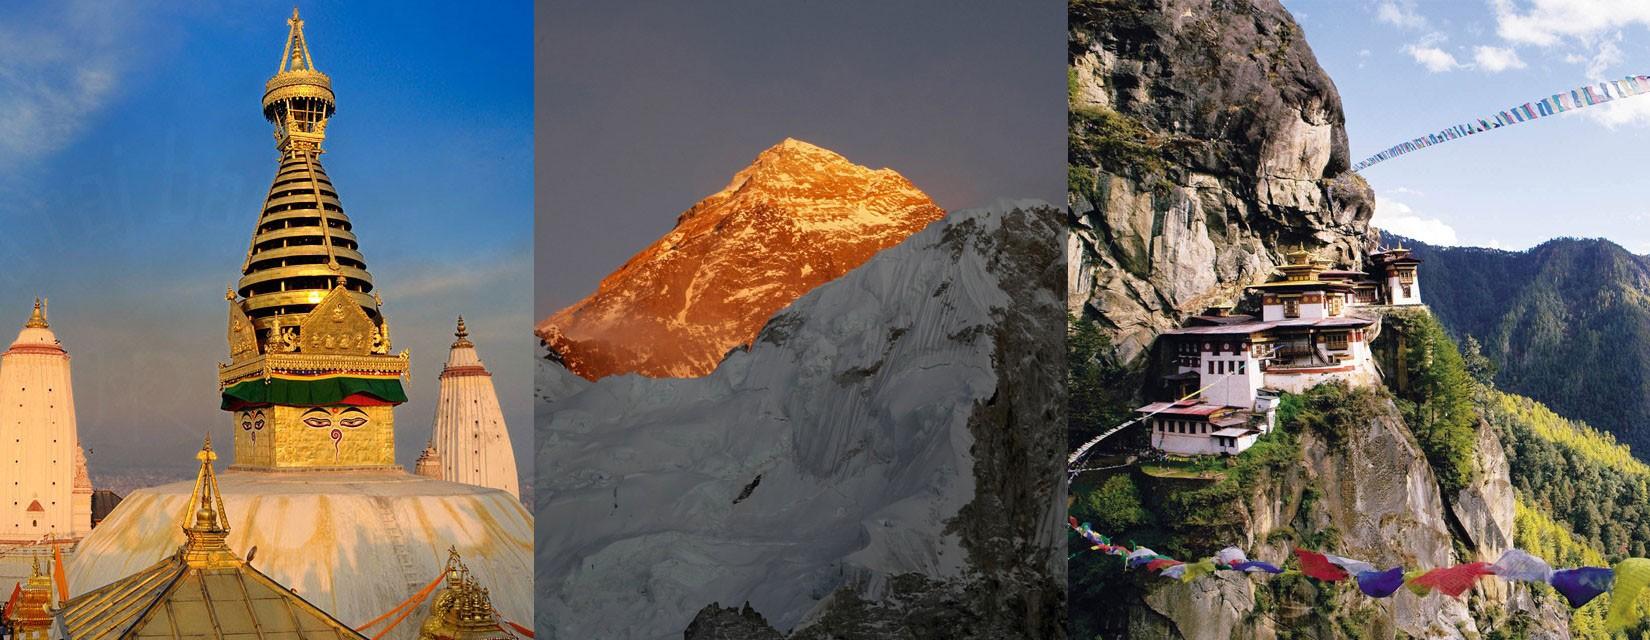 BHUTAN Y NEPAL TOUR, DOS JOYAS DE ASIA TOURS